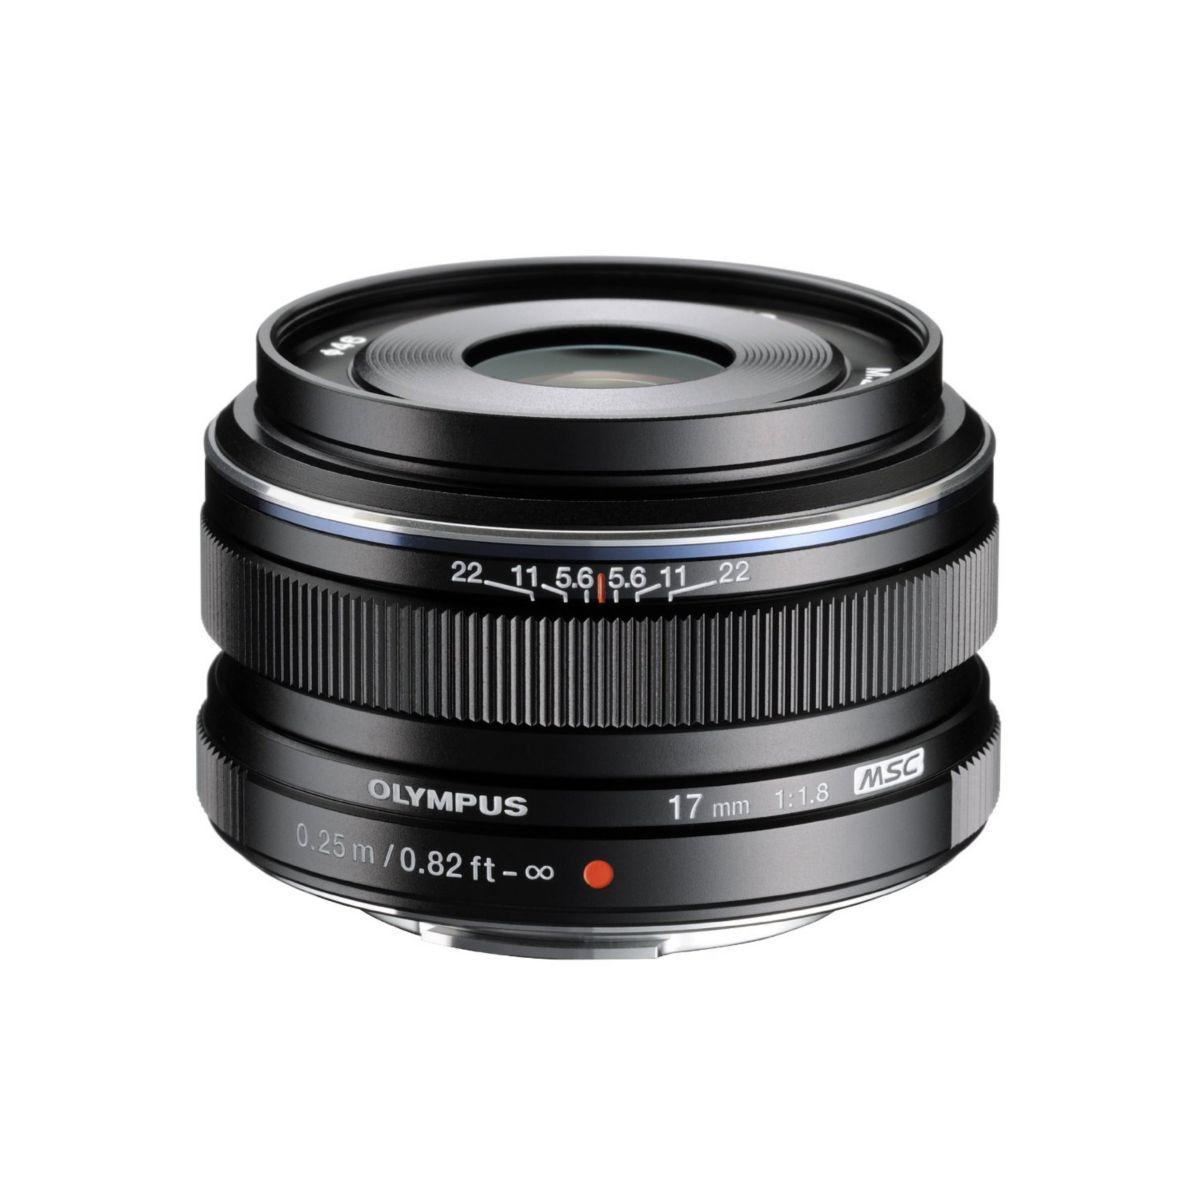 Objectif olympus 17mm f/1.8 noir m.zuiko